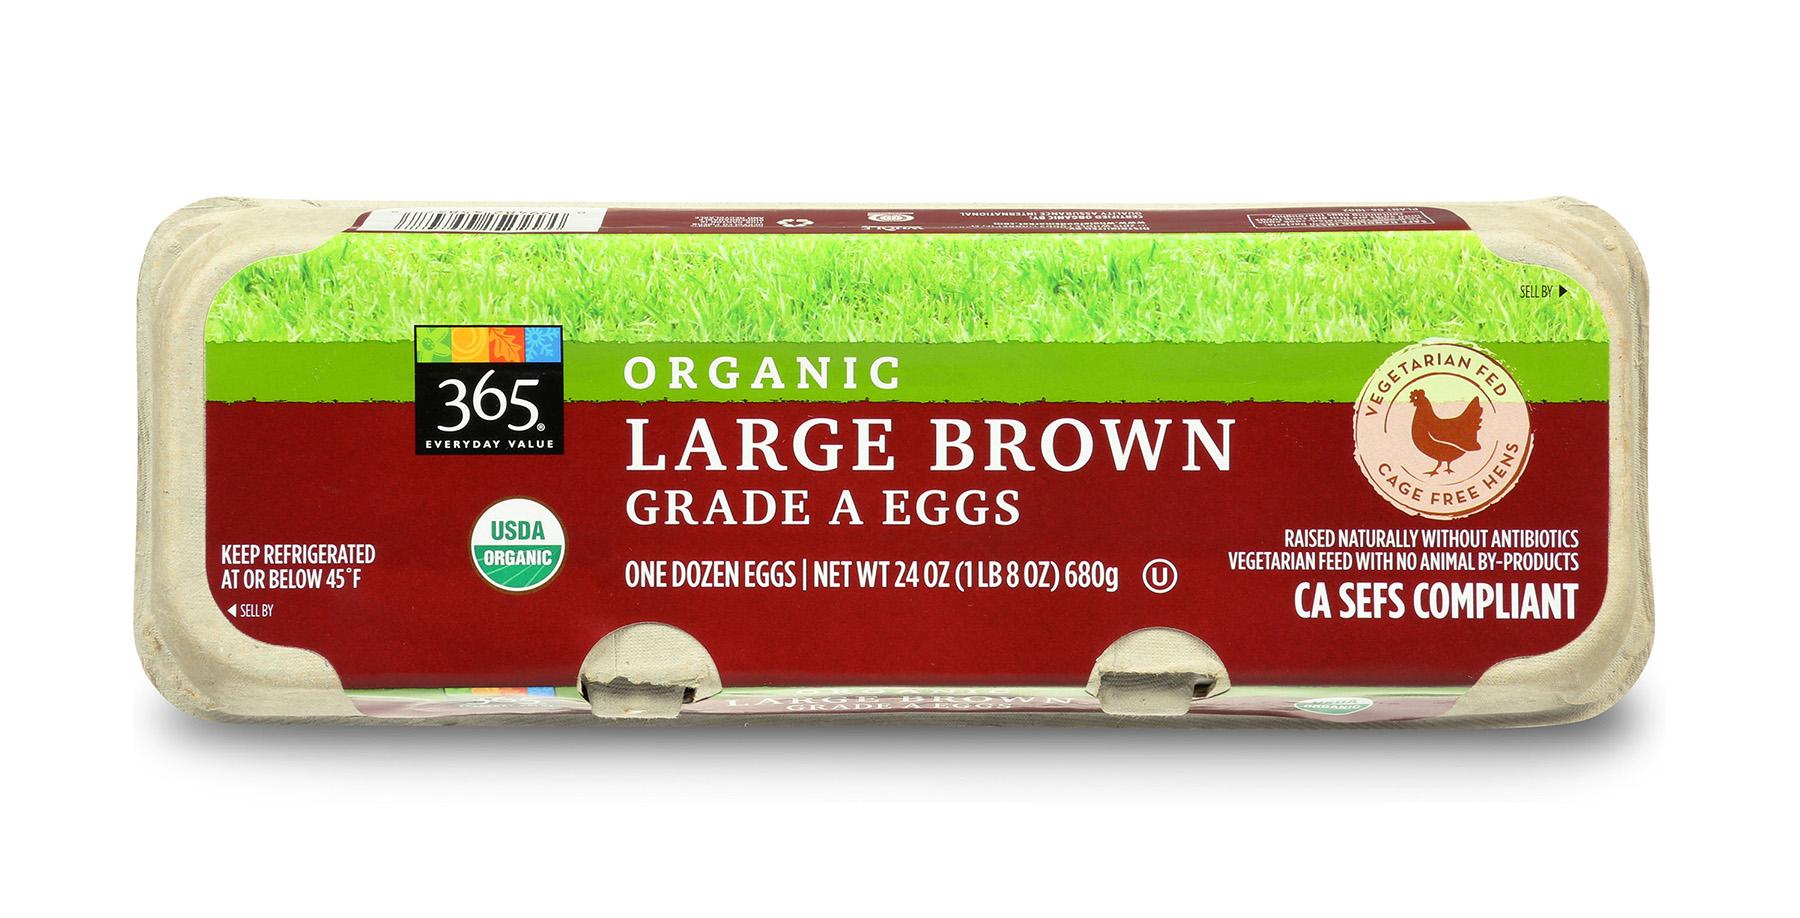 Carton of organic large brown Grade A eggs.